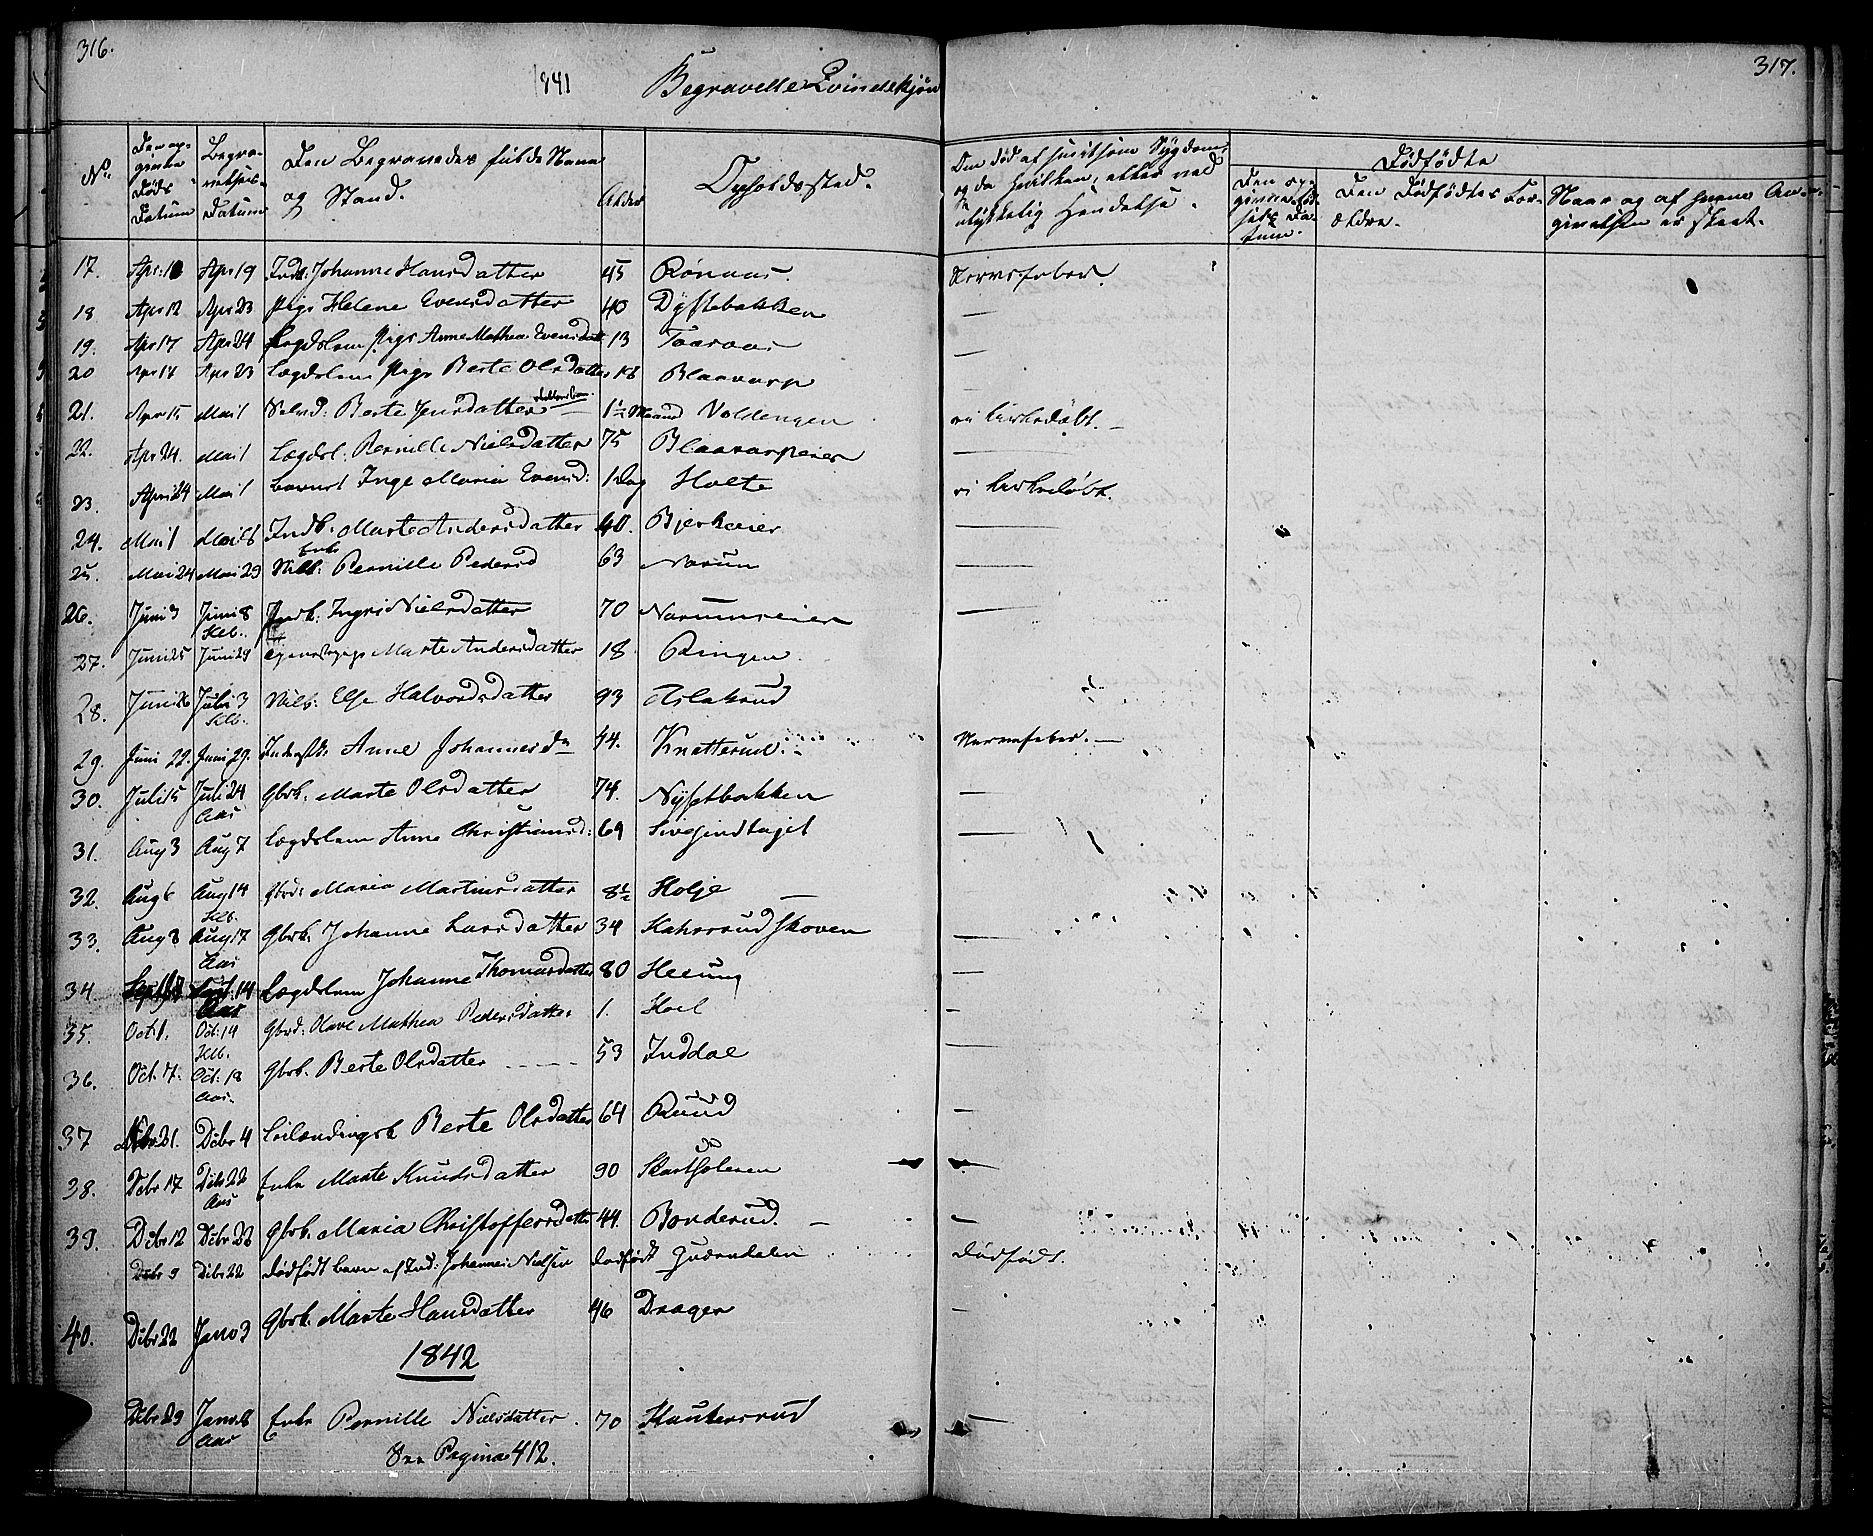 SAH, Vestre Toten prestekontor, H/Ha/Haa/L0003: Ministerialbok nr. 3, 1836-1843, s. 316-317